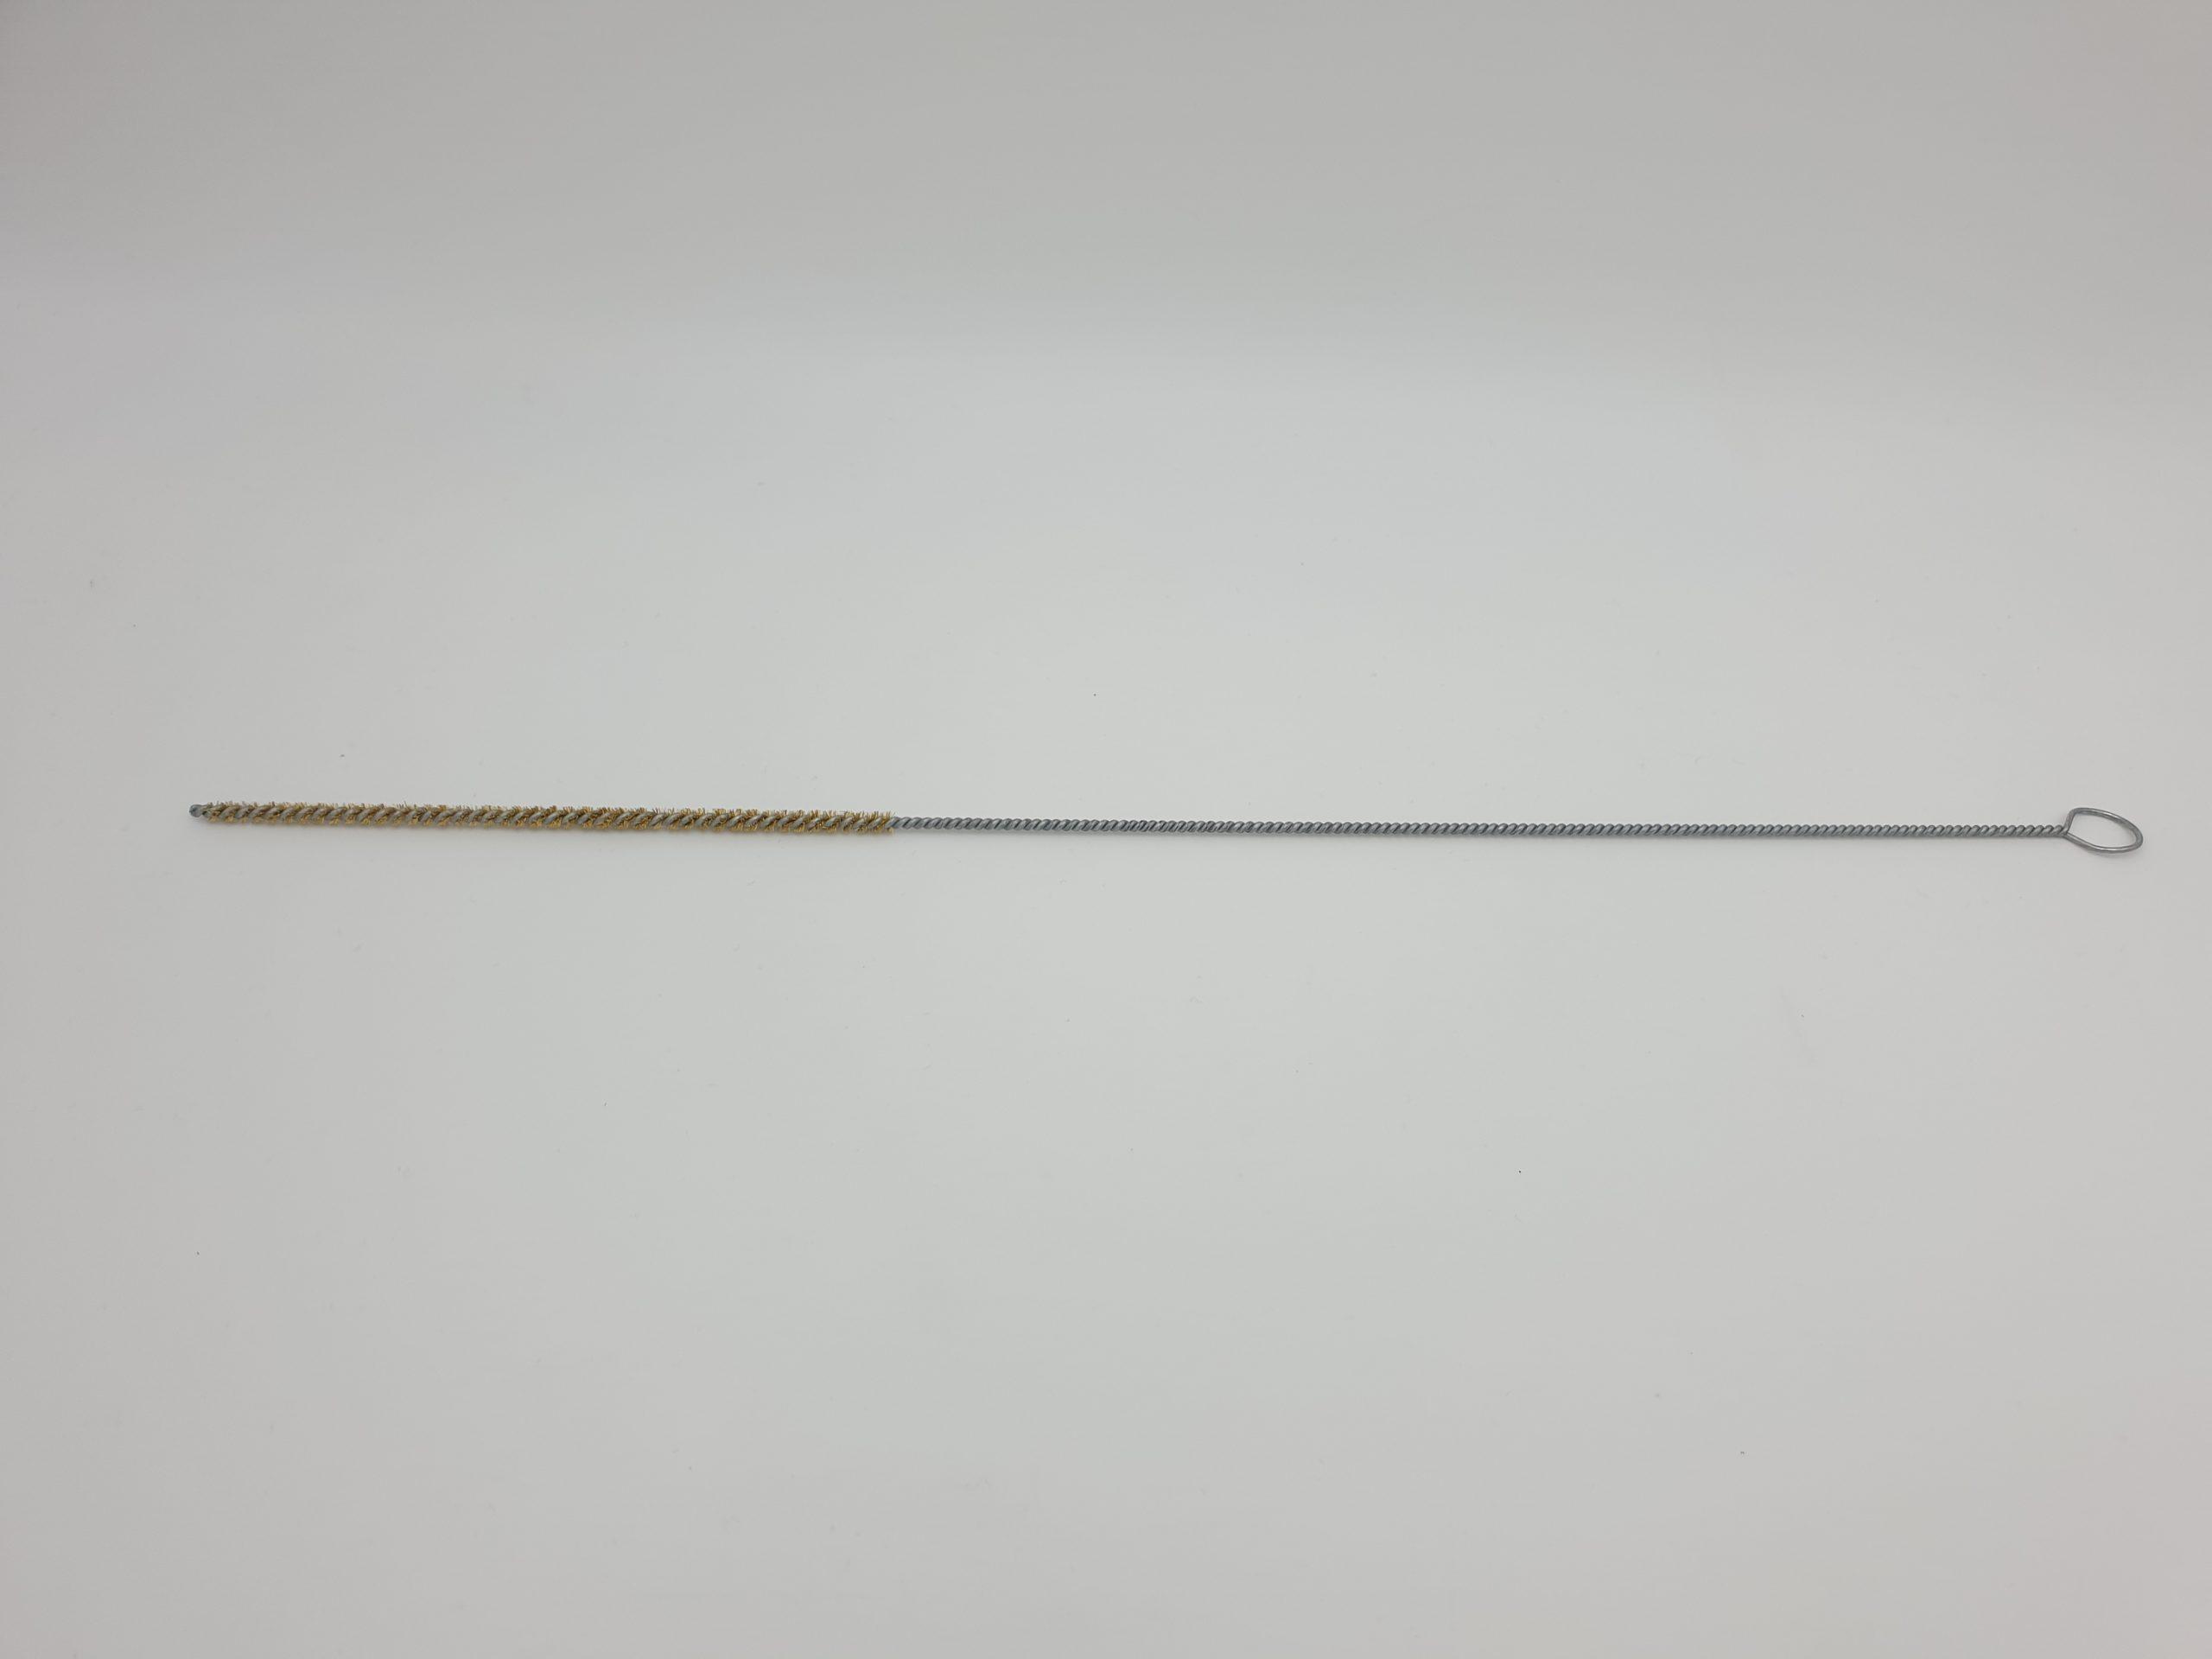 cepillo limpia tubo manual latón